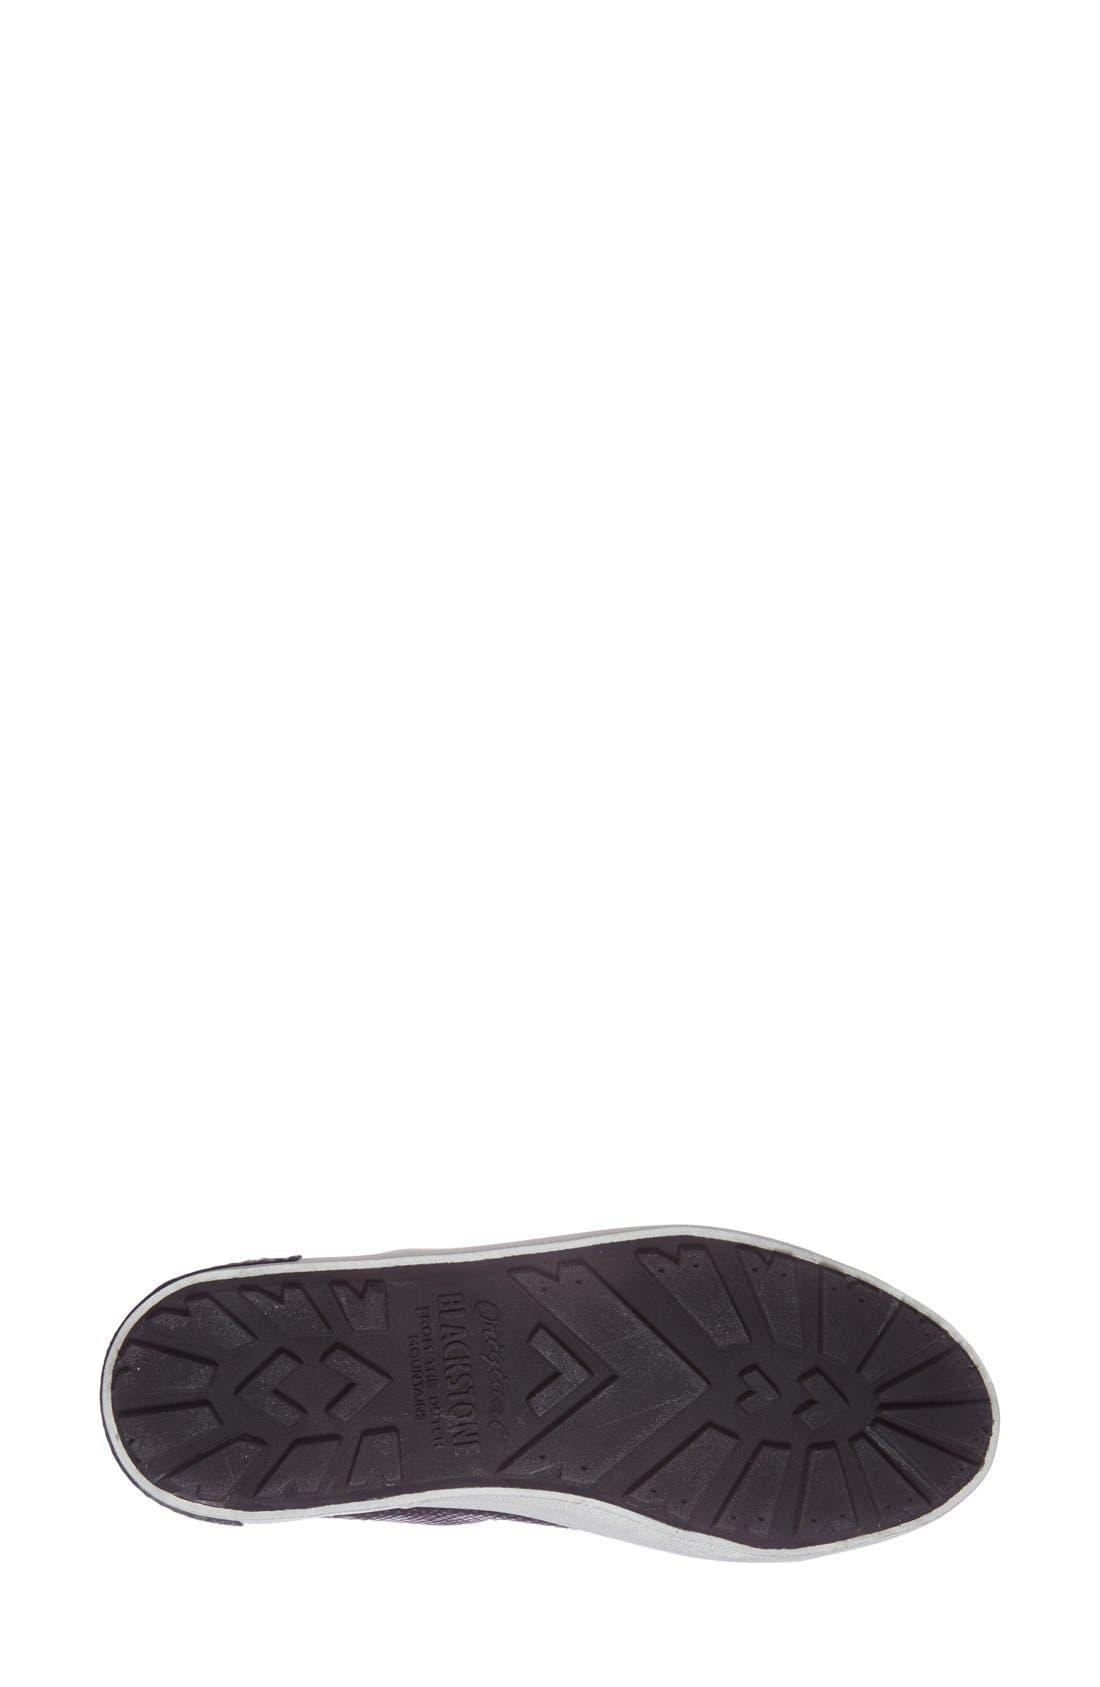 BLACKSTONE,                             'KL57' High Top Sneaker,                             Alternate thumbnail 4, color,                             006